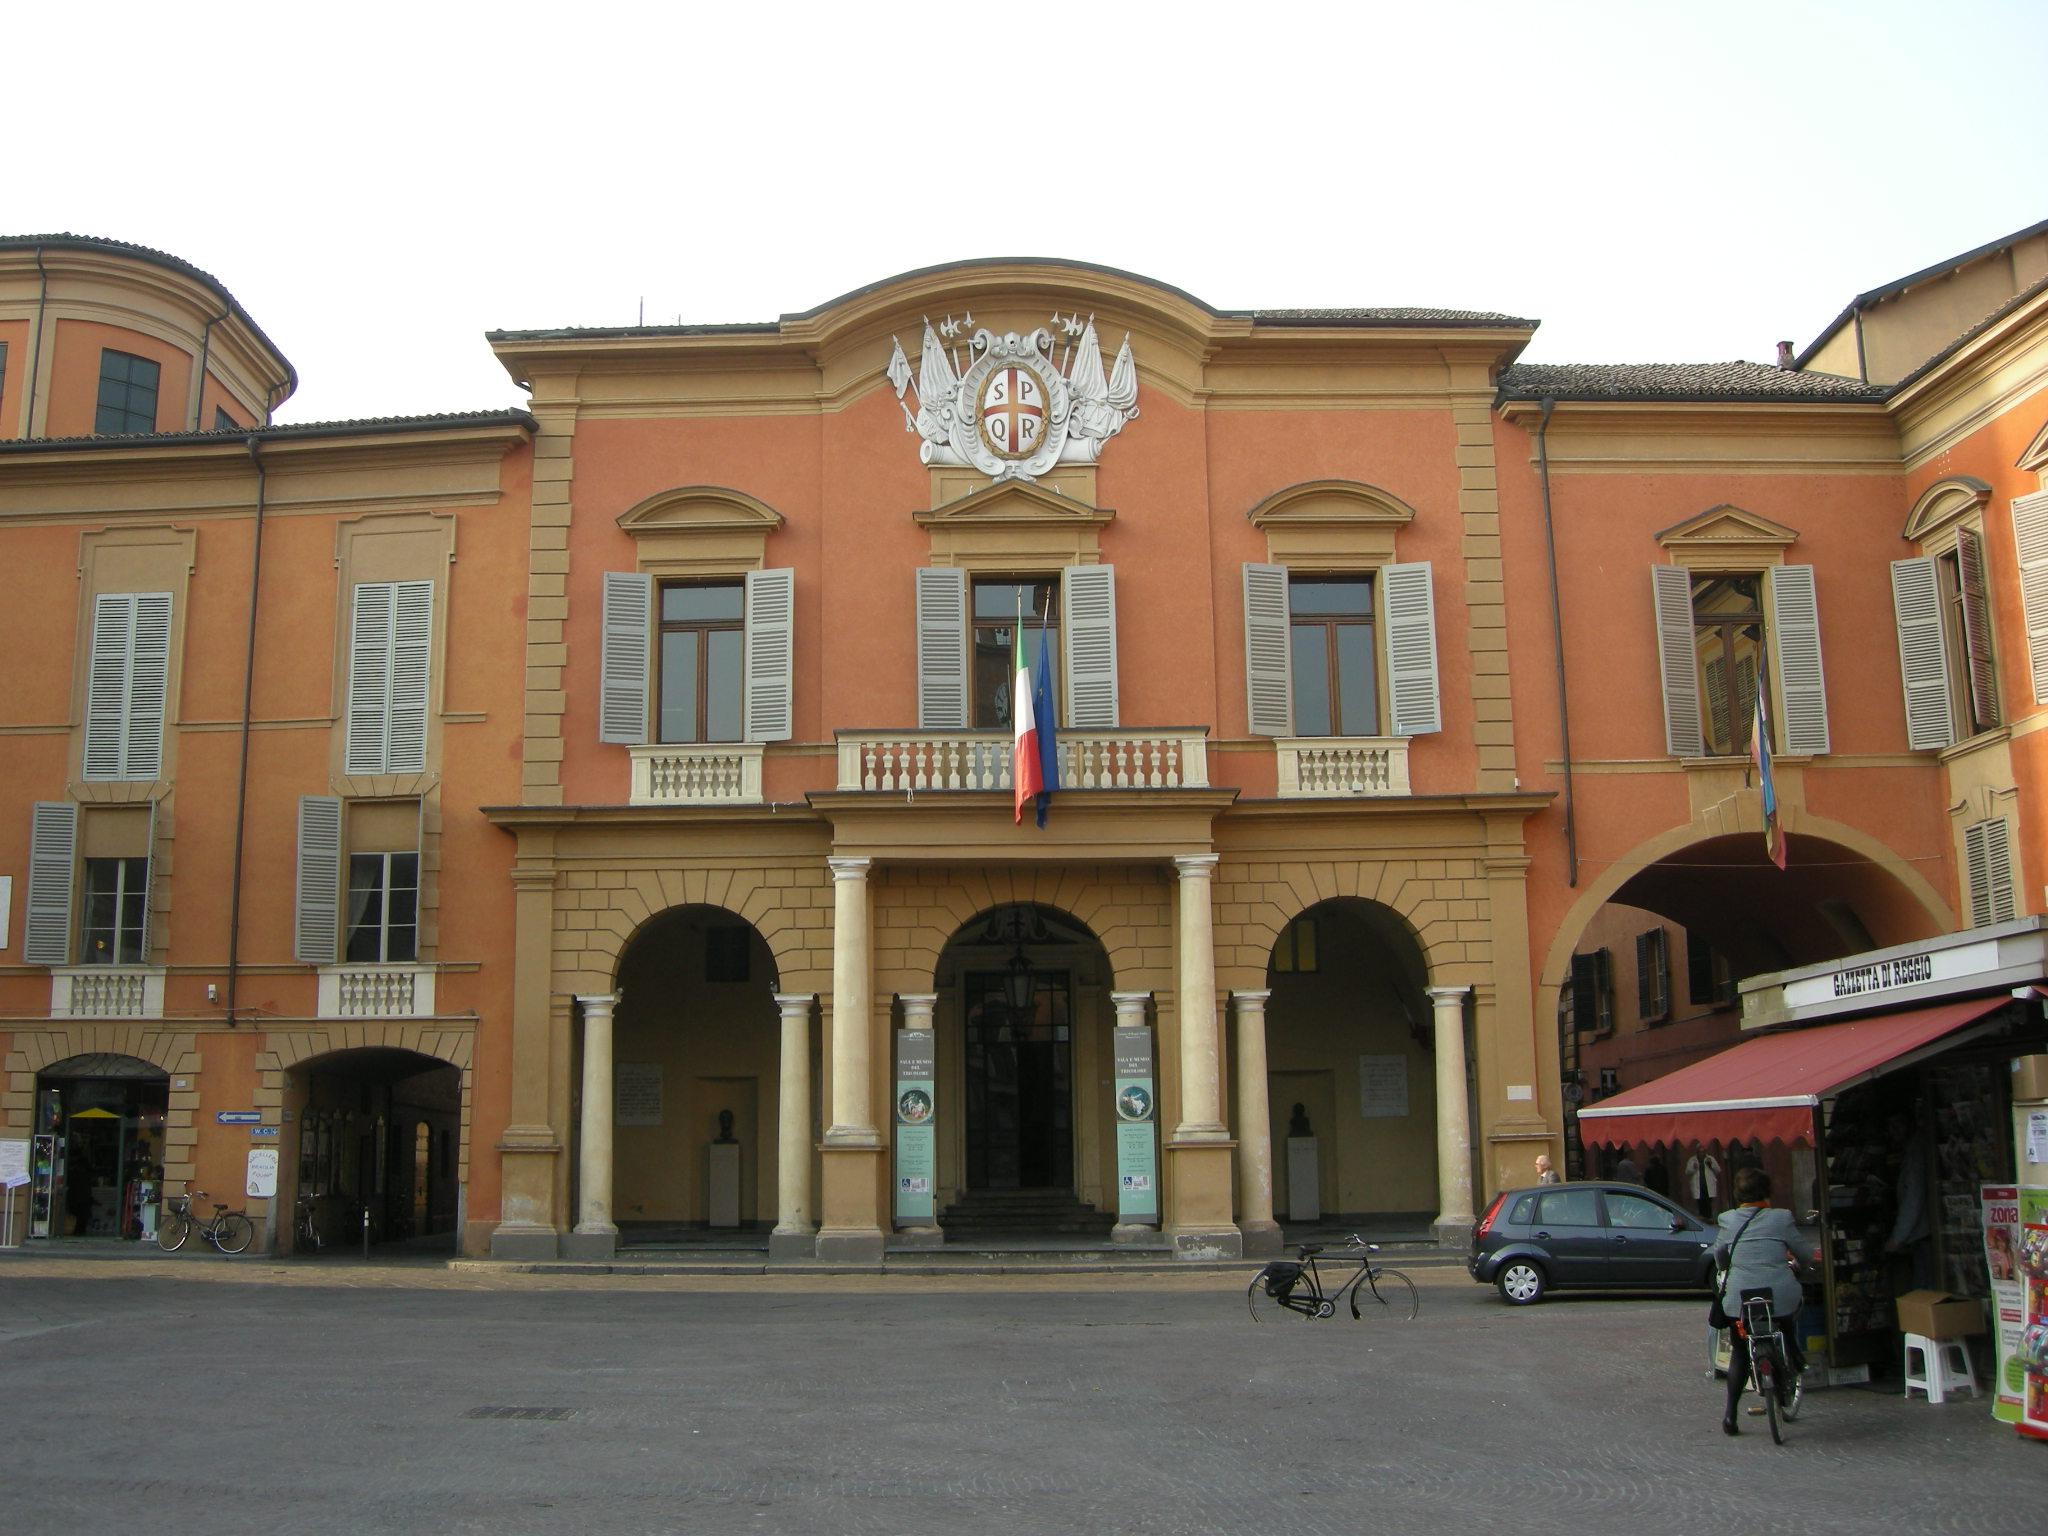 Piazza_duomo_(Reggio_emilia)_01_municipio